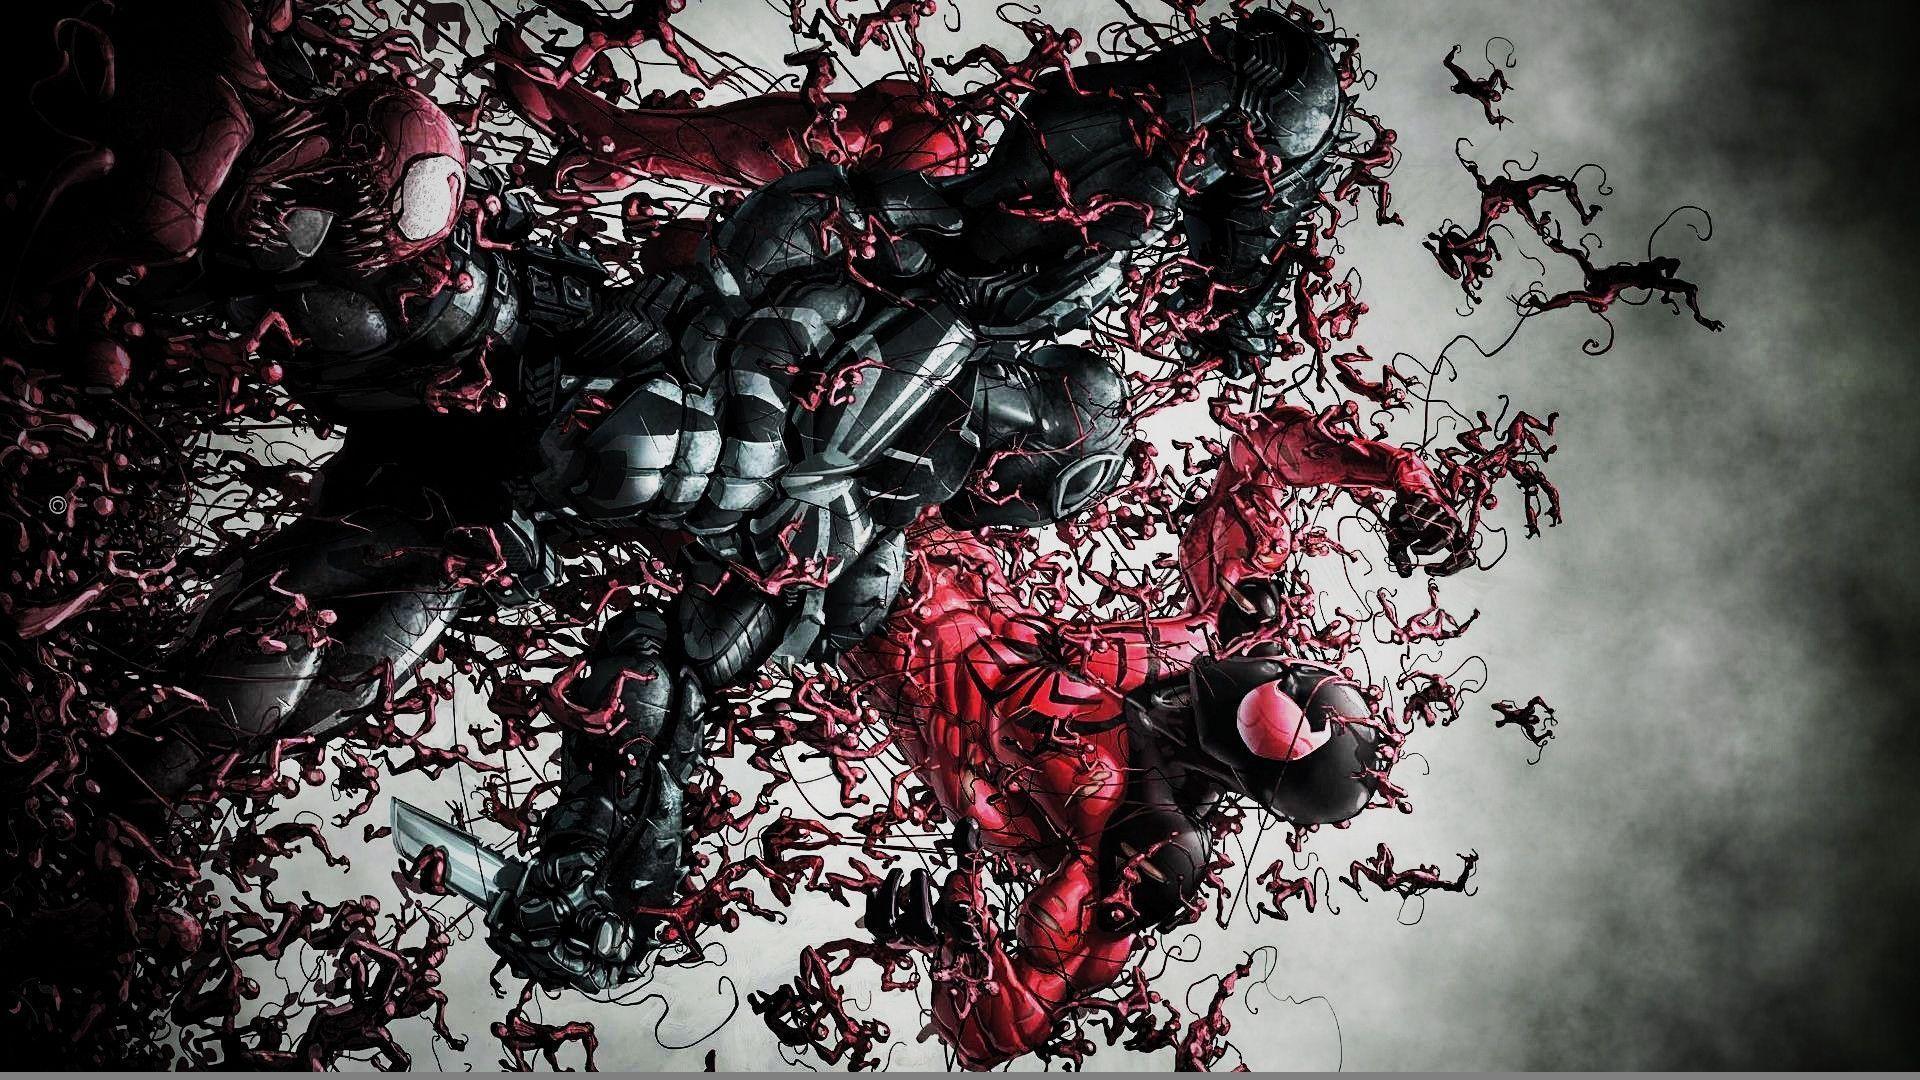 venom wallpaper hd 1920x1080 - photo #18